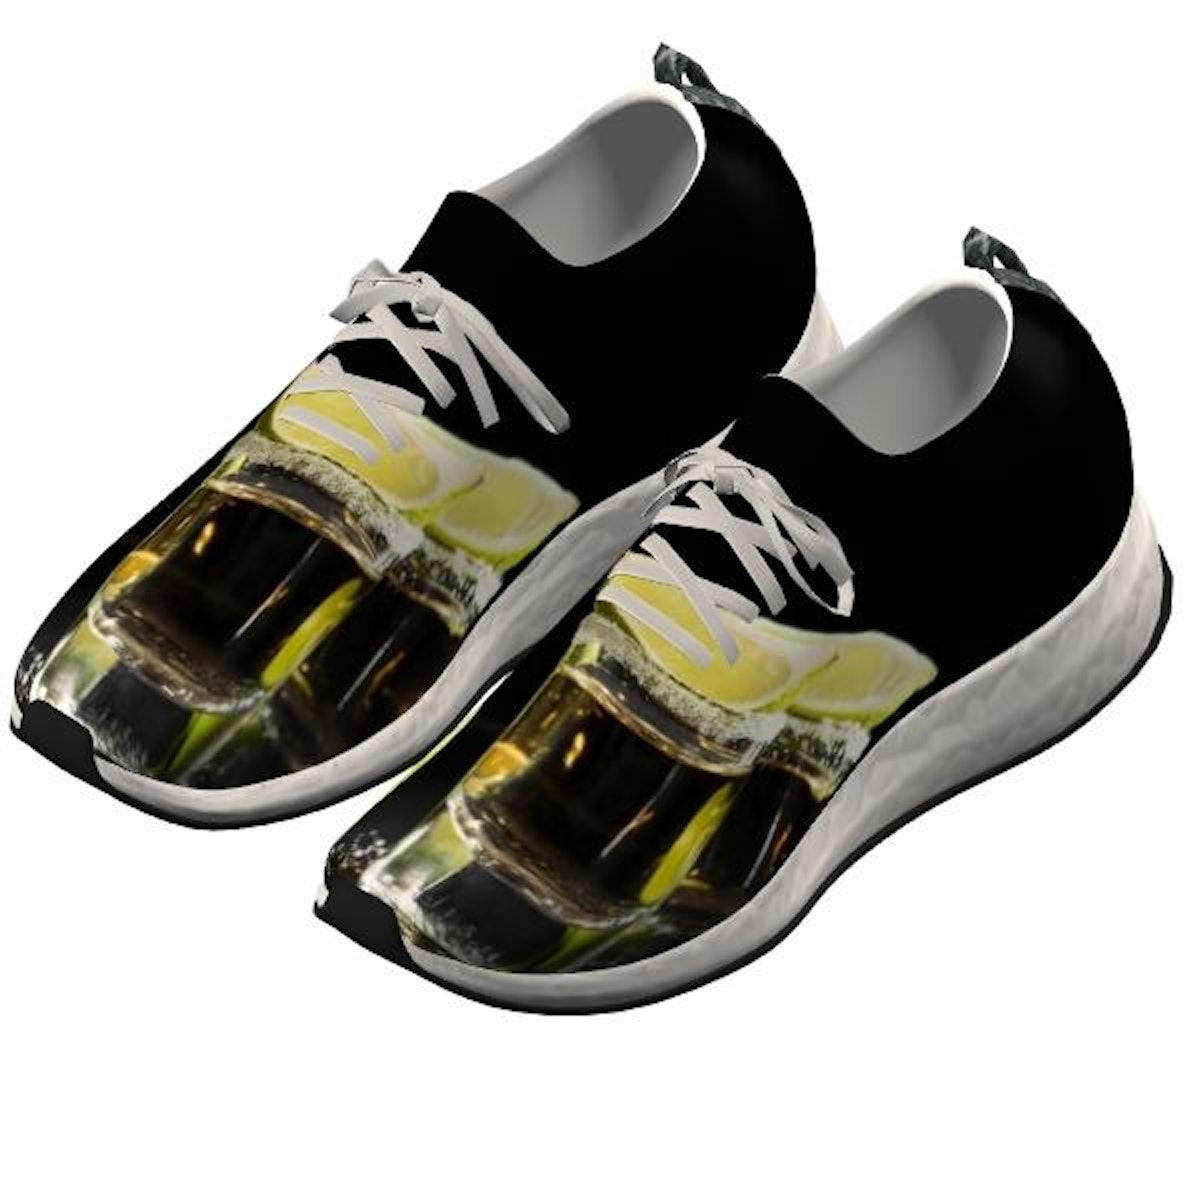 Tequila Essentials Sneakers